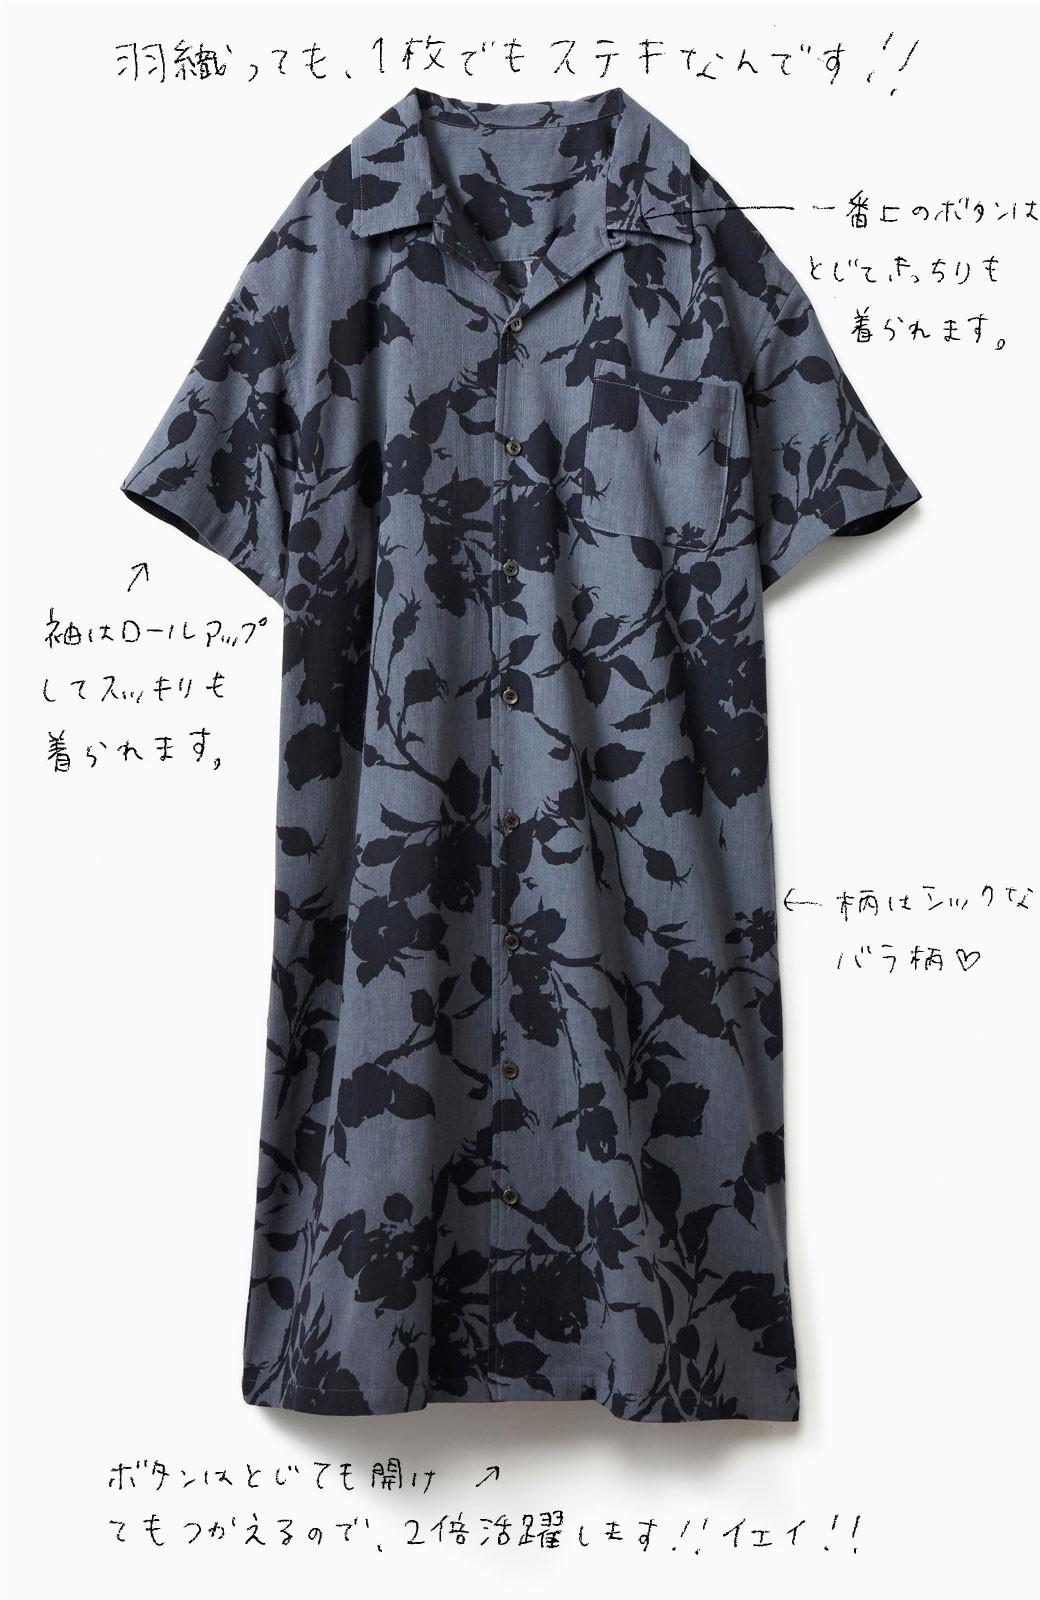 haco! 【コラボ3年目!】京都の浴衣屋さんと作った浴衣生地のシャツワンピース <グレー系その他>の商品写真1